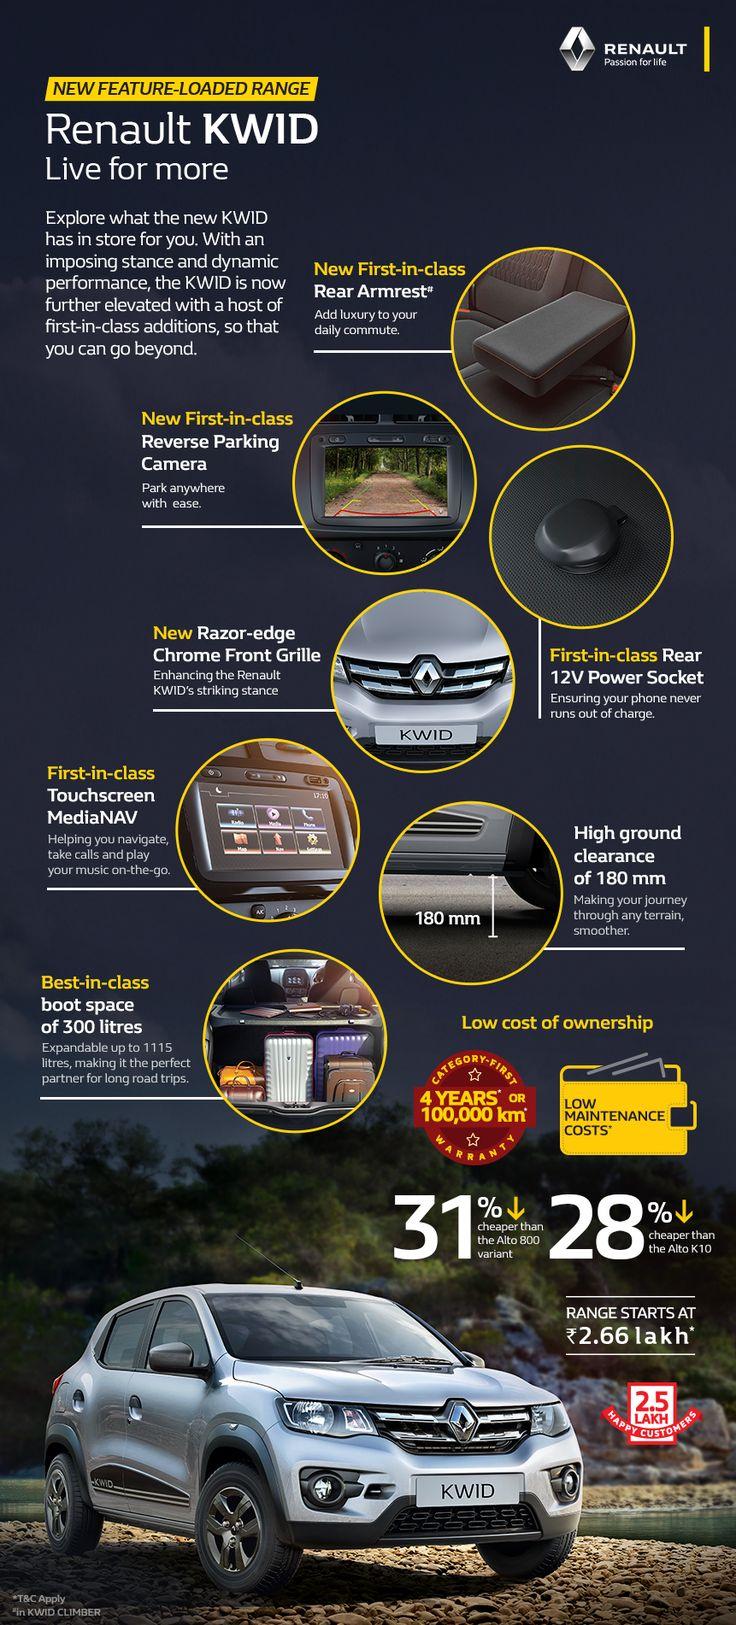 New Features in Renault KWID Autos